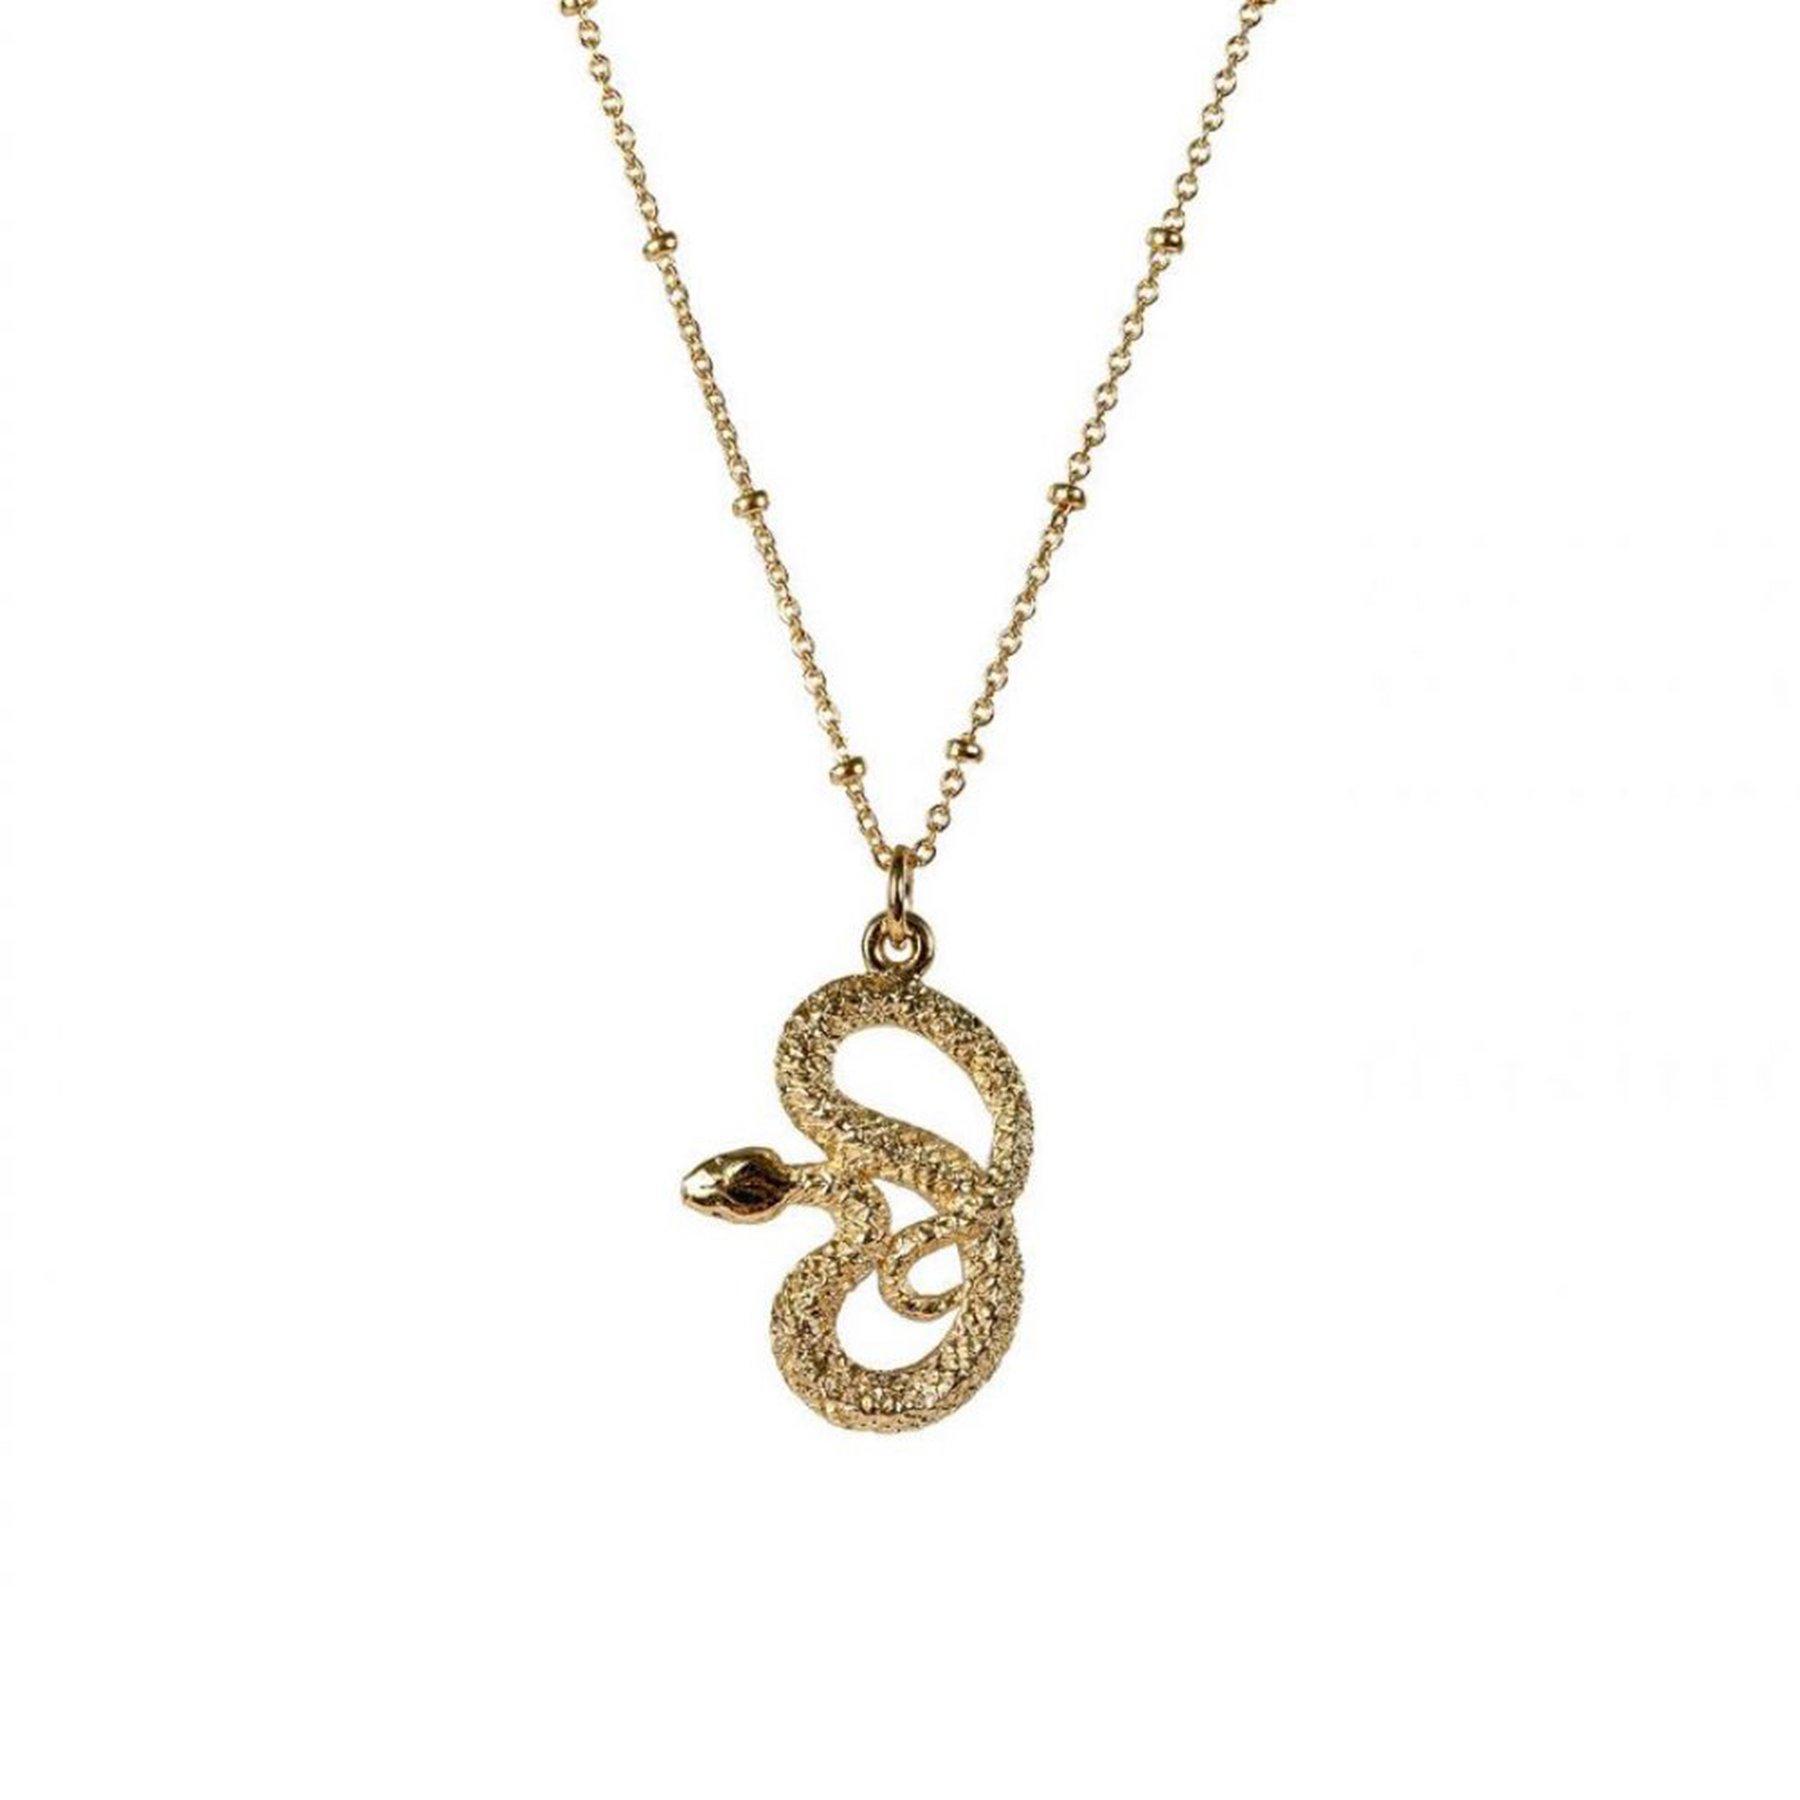 Kundalini Snake Charm  45cm Chain